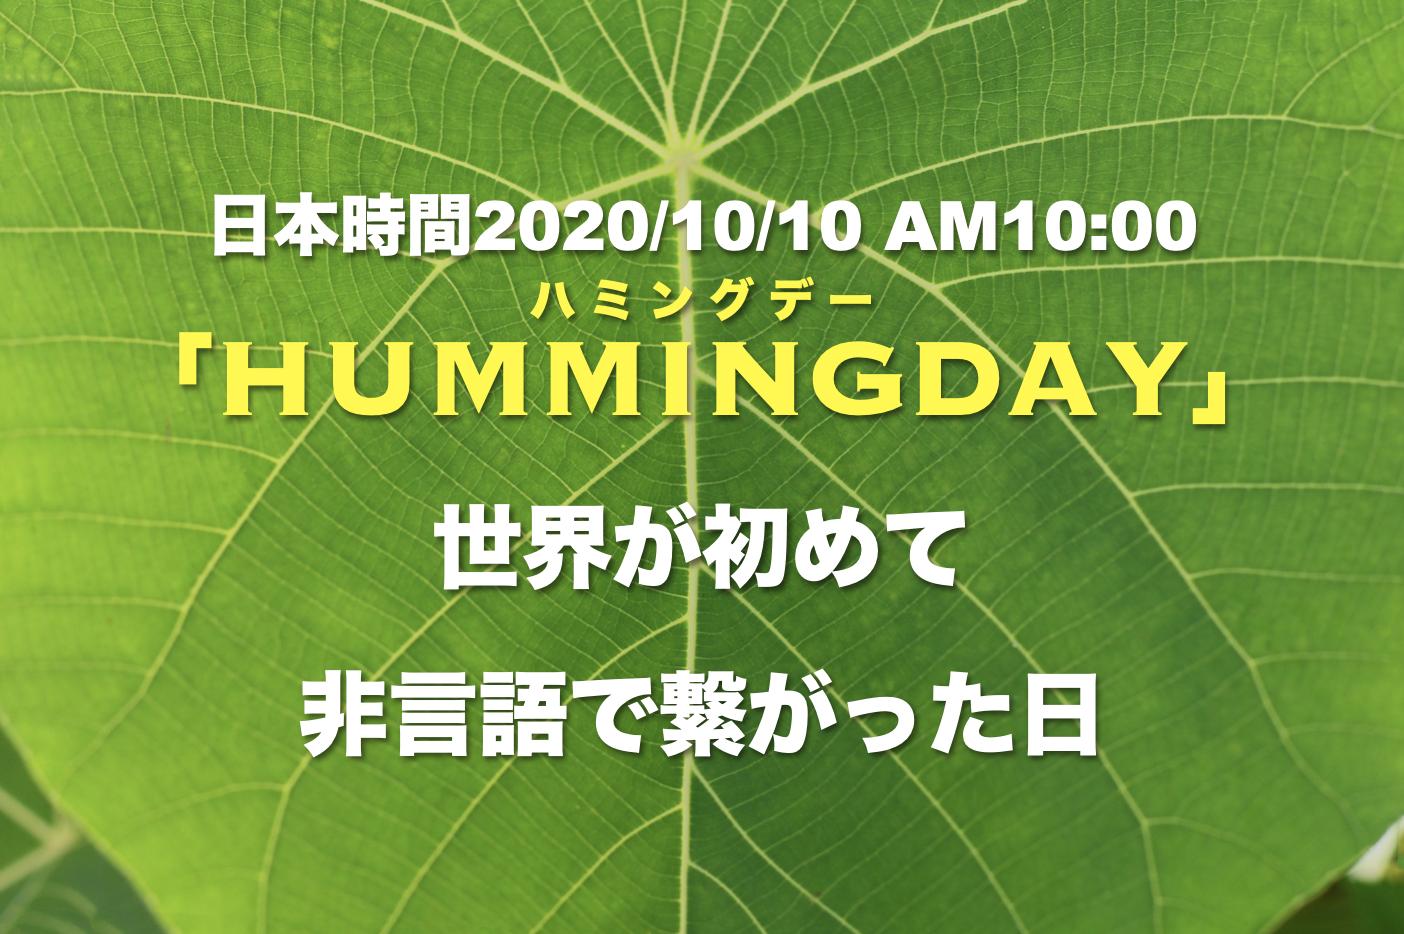 Humming for PEACEとは(ハミングフォーピースとは)日本発祥の平和活動・ハミングで世界平和